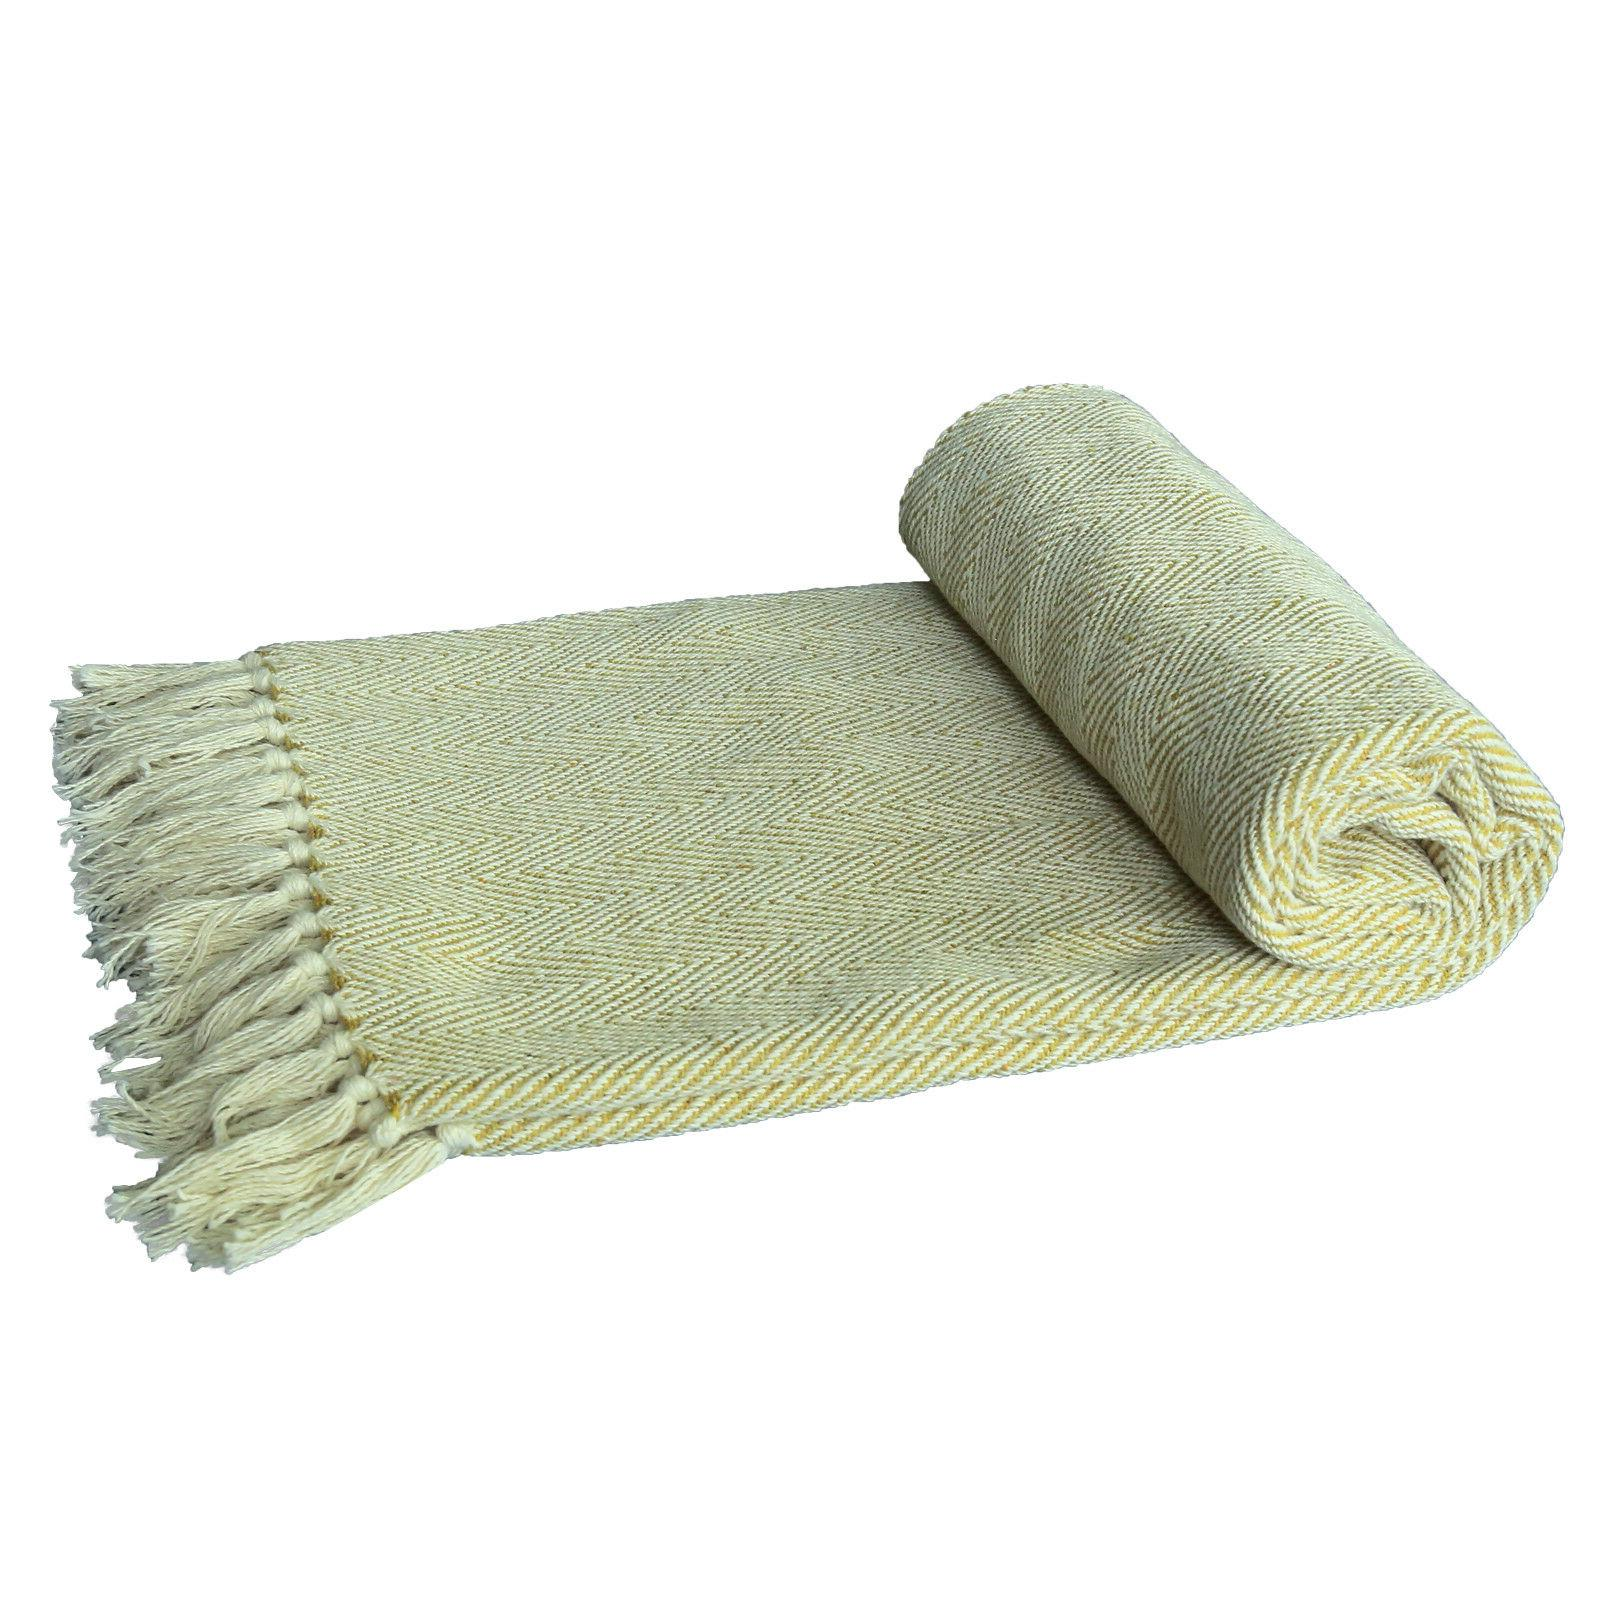 Throw Blanket Woven Decorative